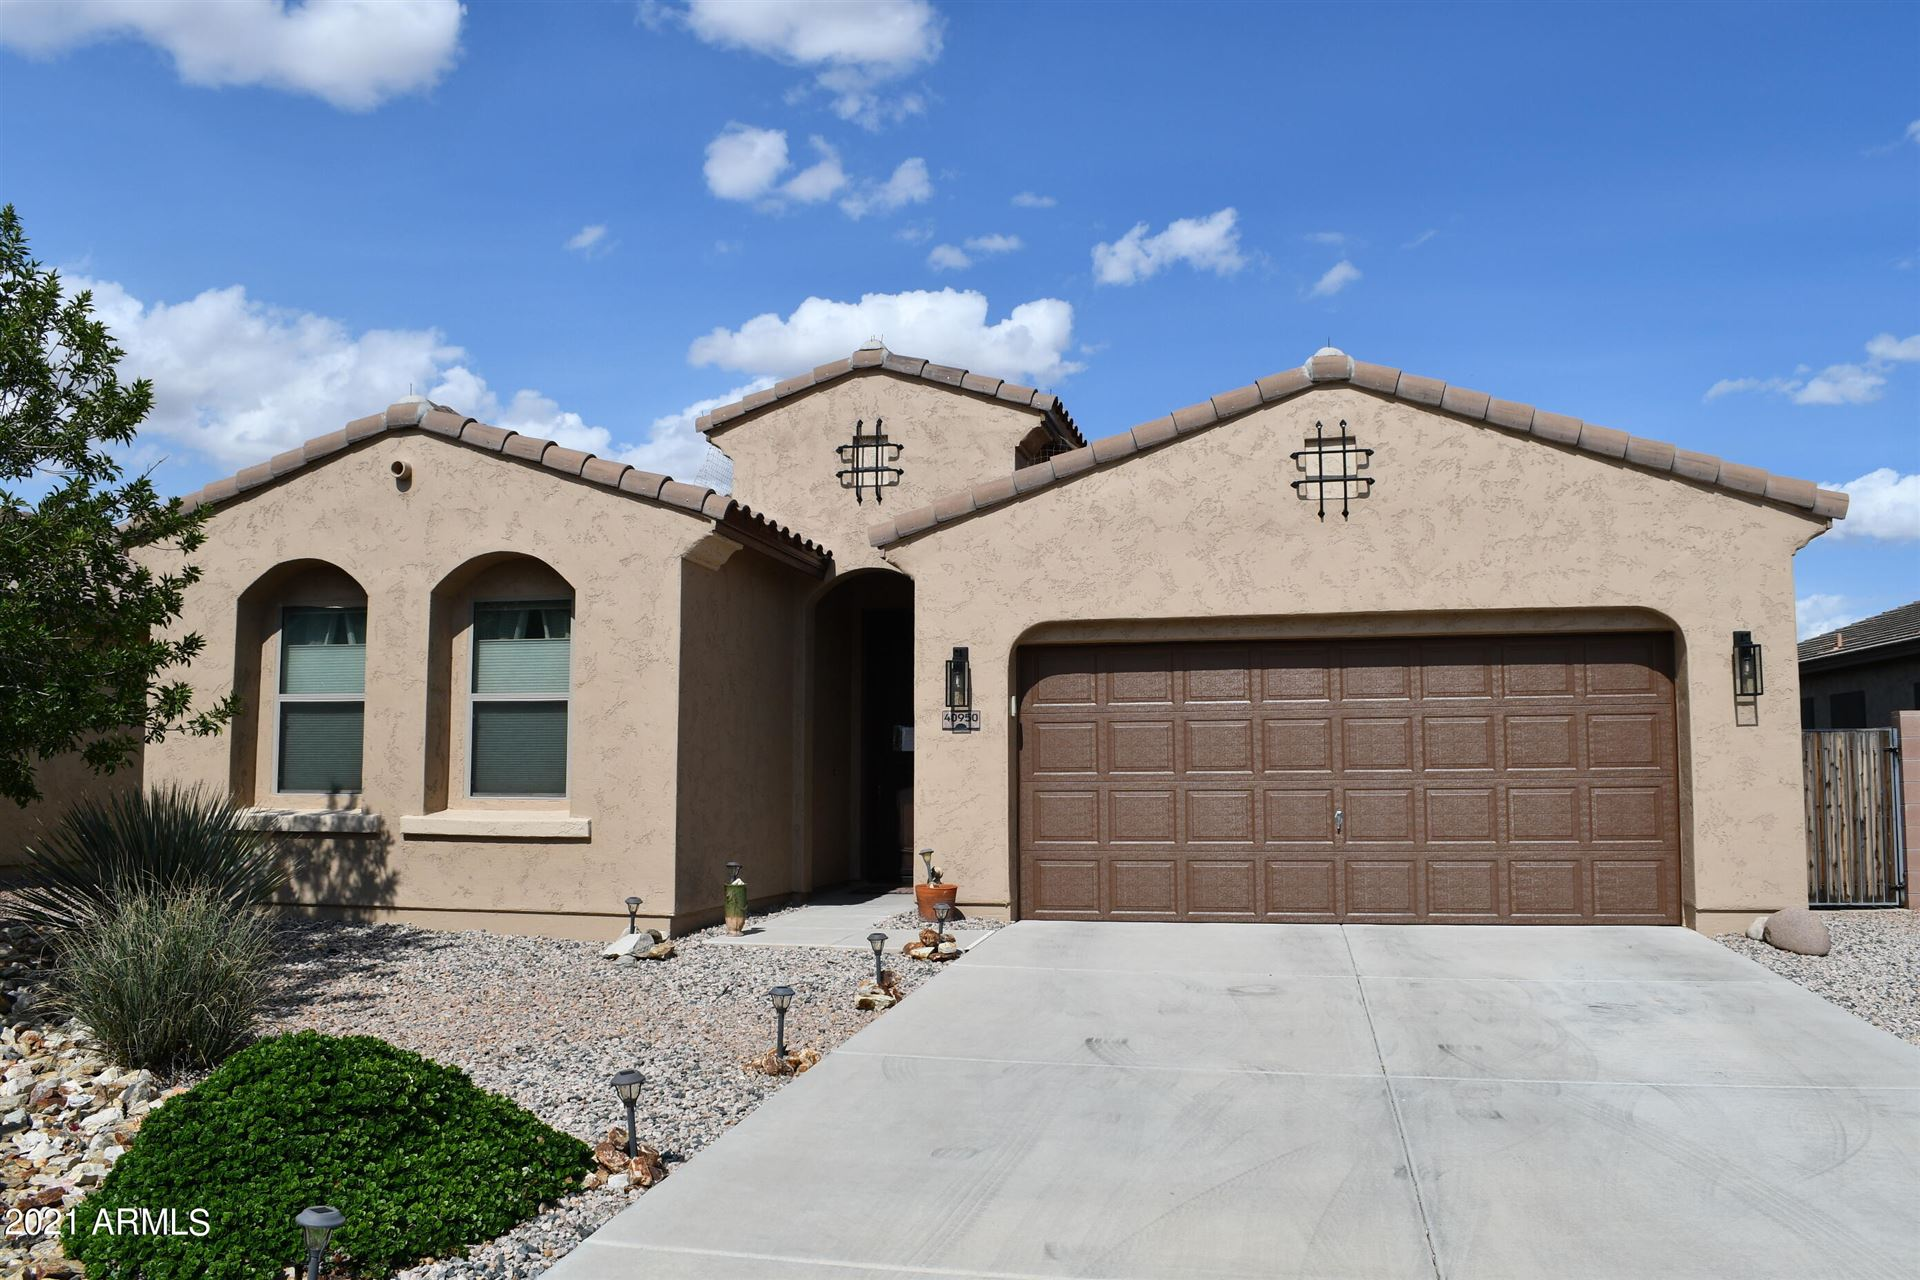 Photo for 40950 W BEDFORD Drive, Maricopa, AZ 85138 (MLS # 6283474)